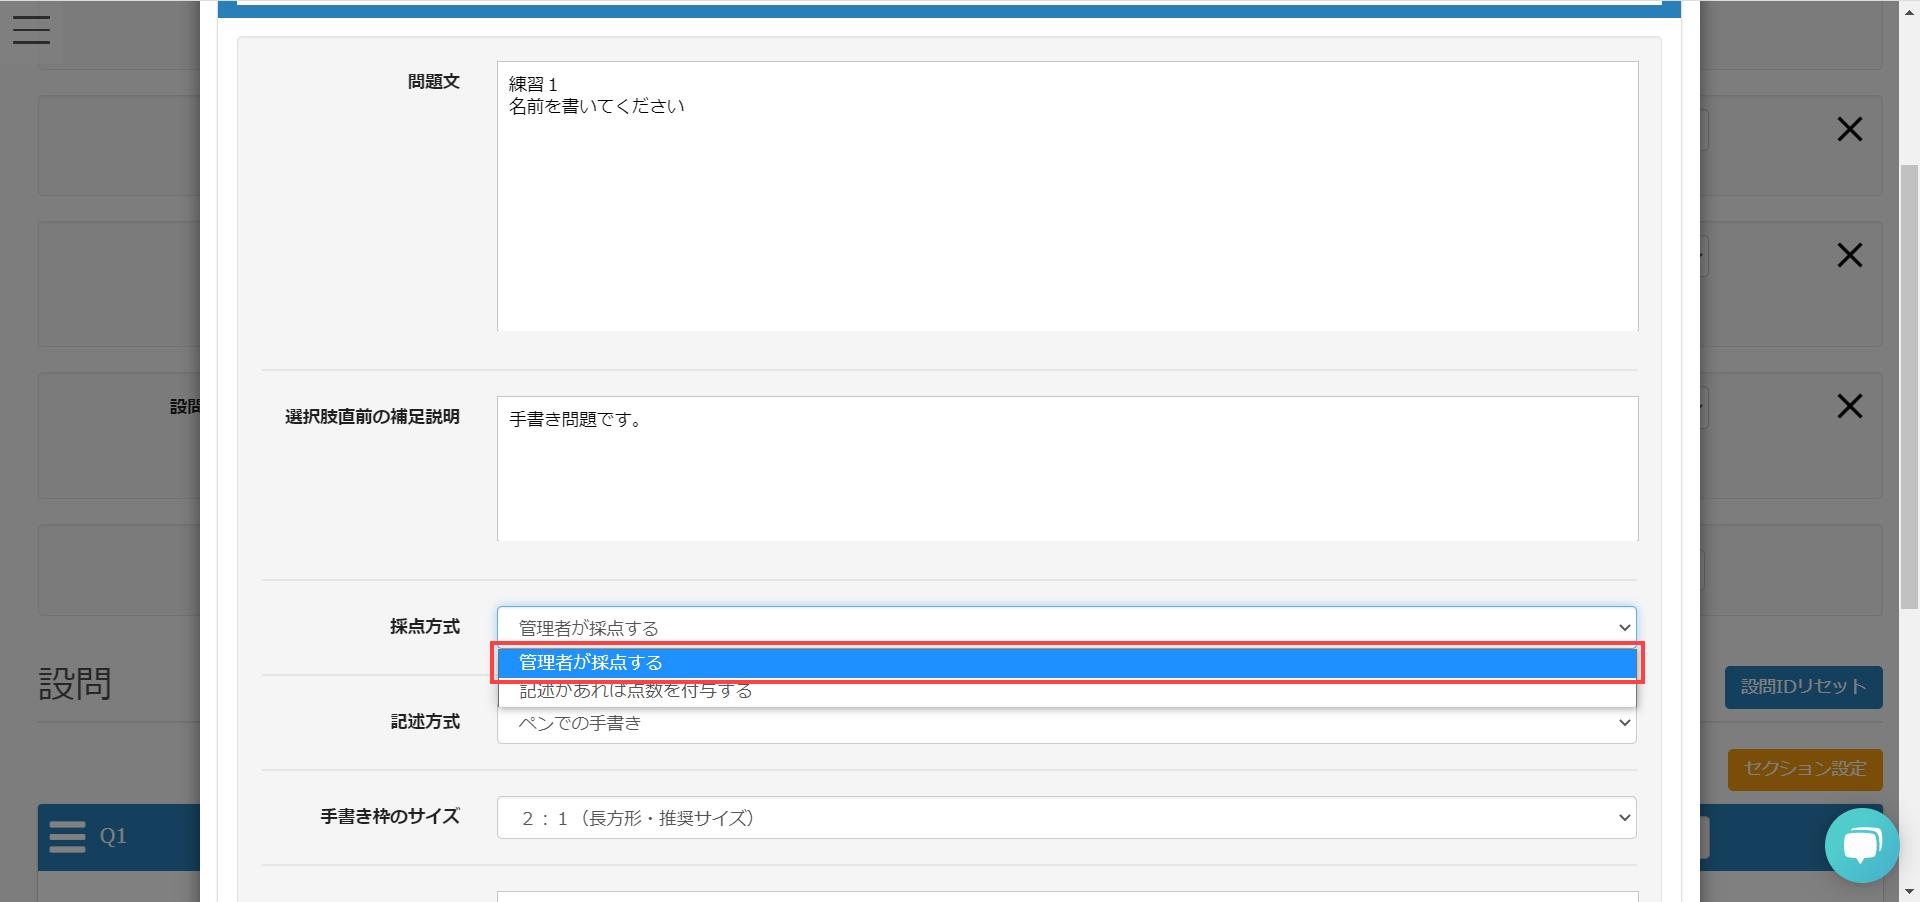 learningBOX-2.15系